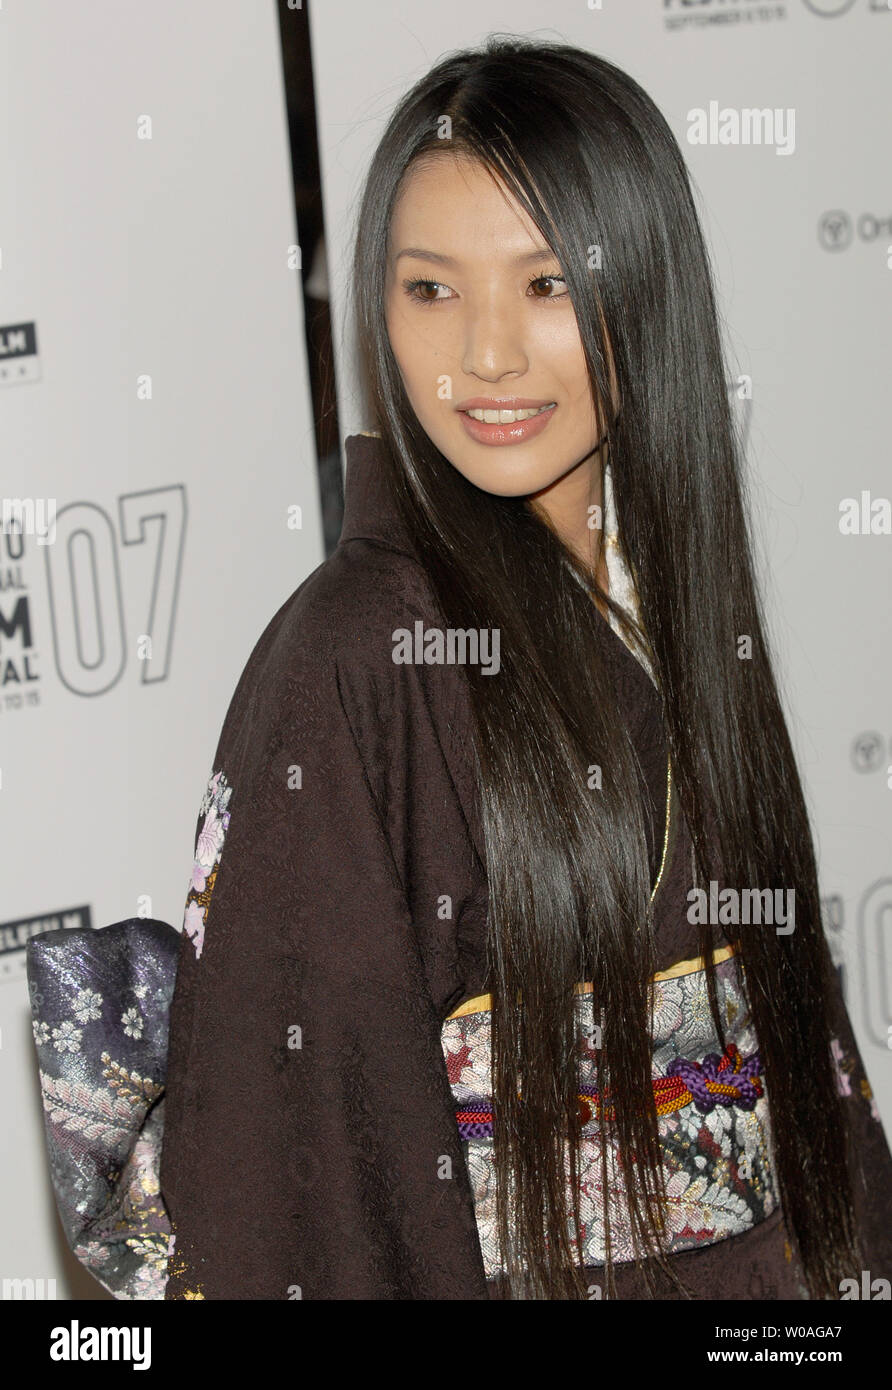 Japanese actress Sei Ashina arrives for the Toronto International Film  Festival premiere of